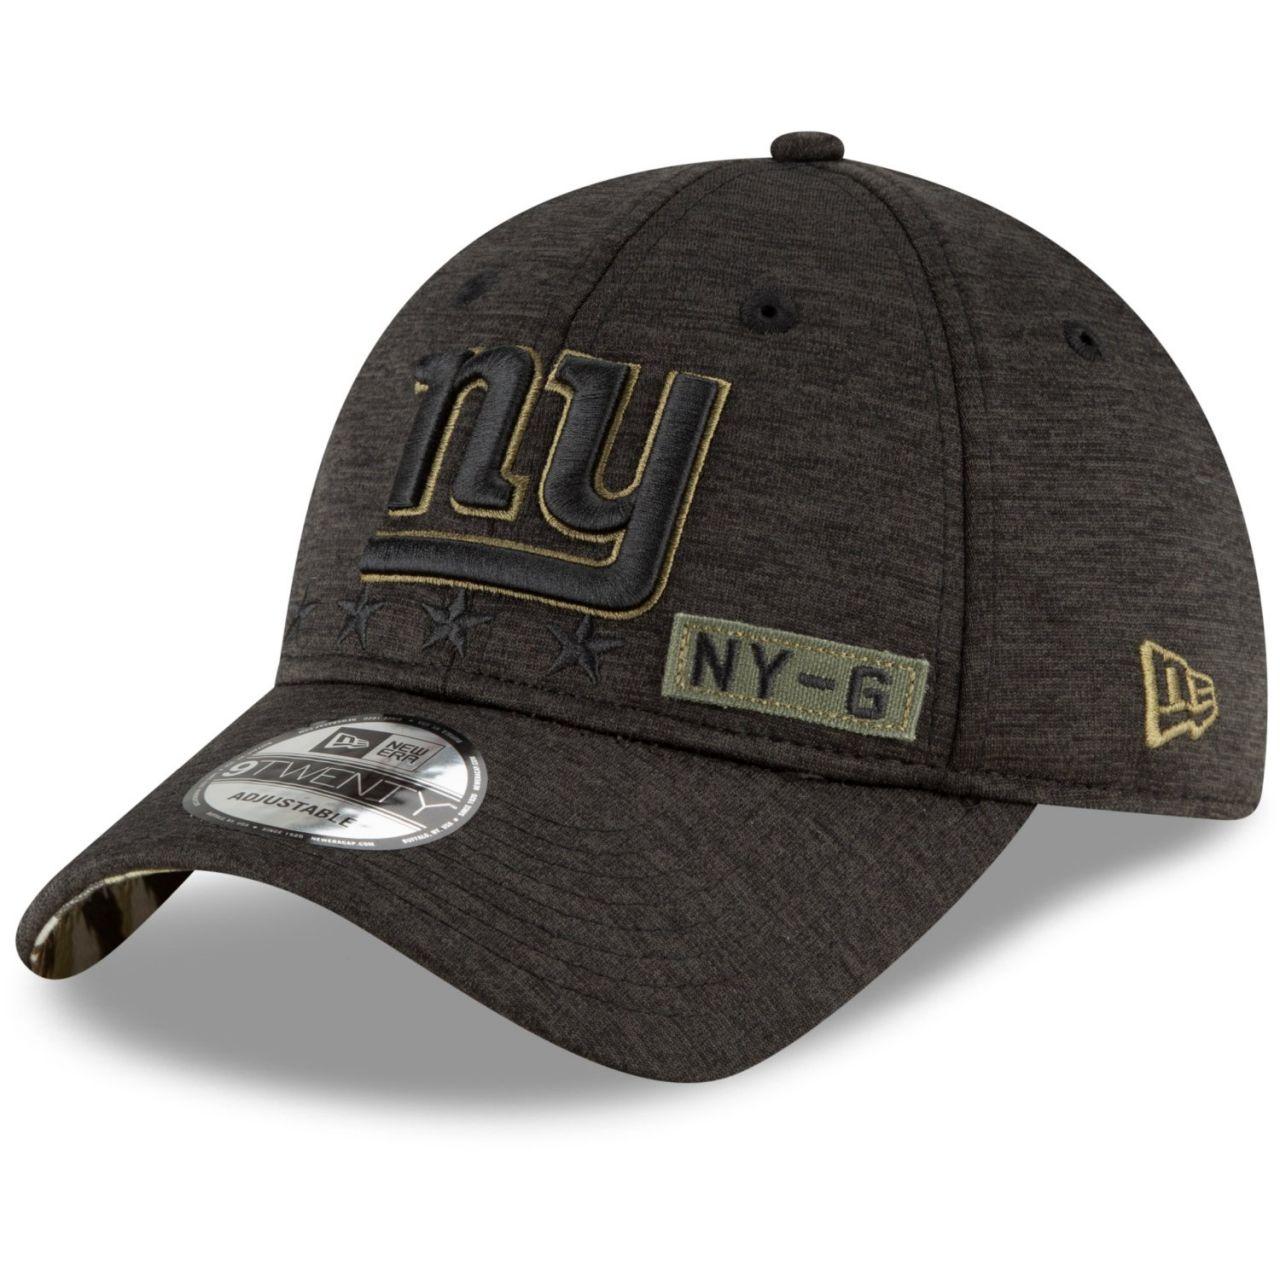 amfoo - New Era 9TWENTY Cap Salute to Service New York Giants